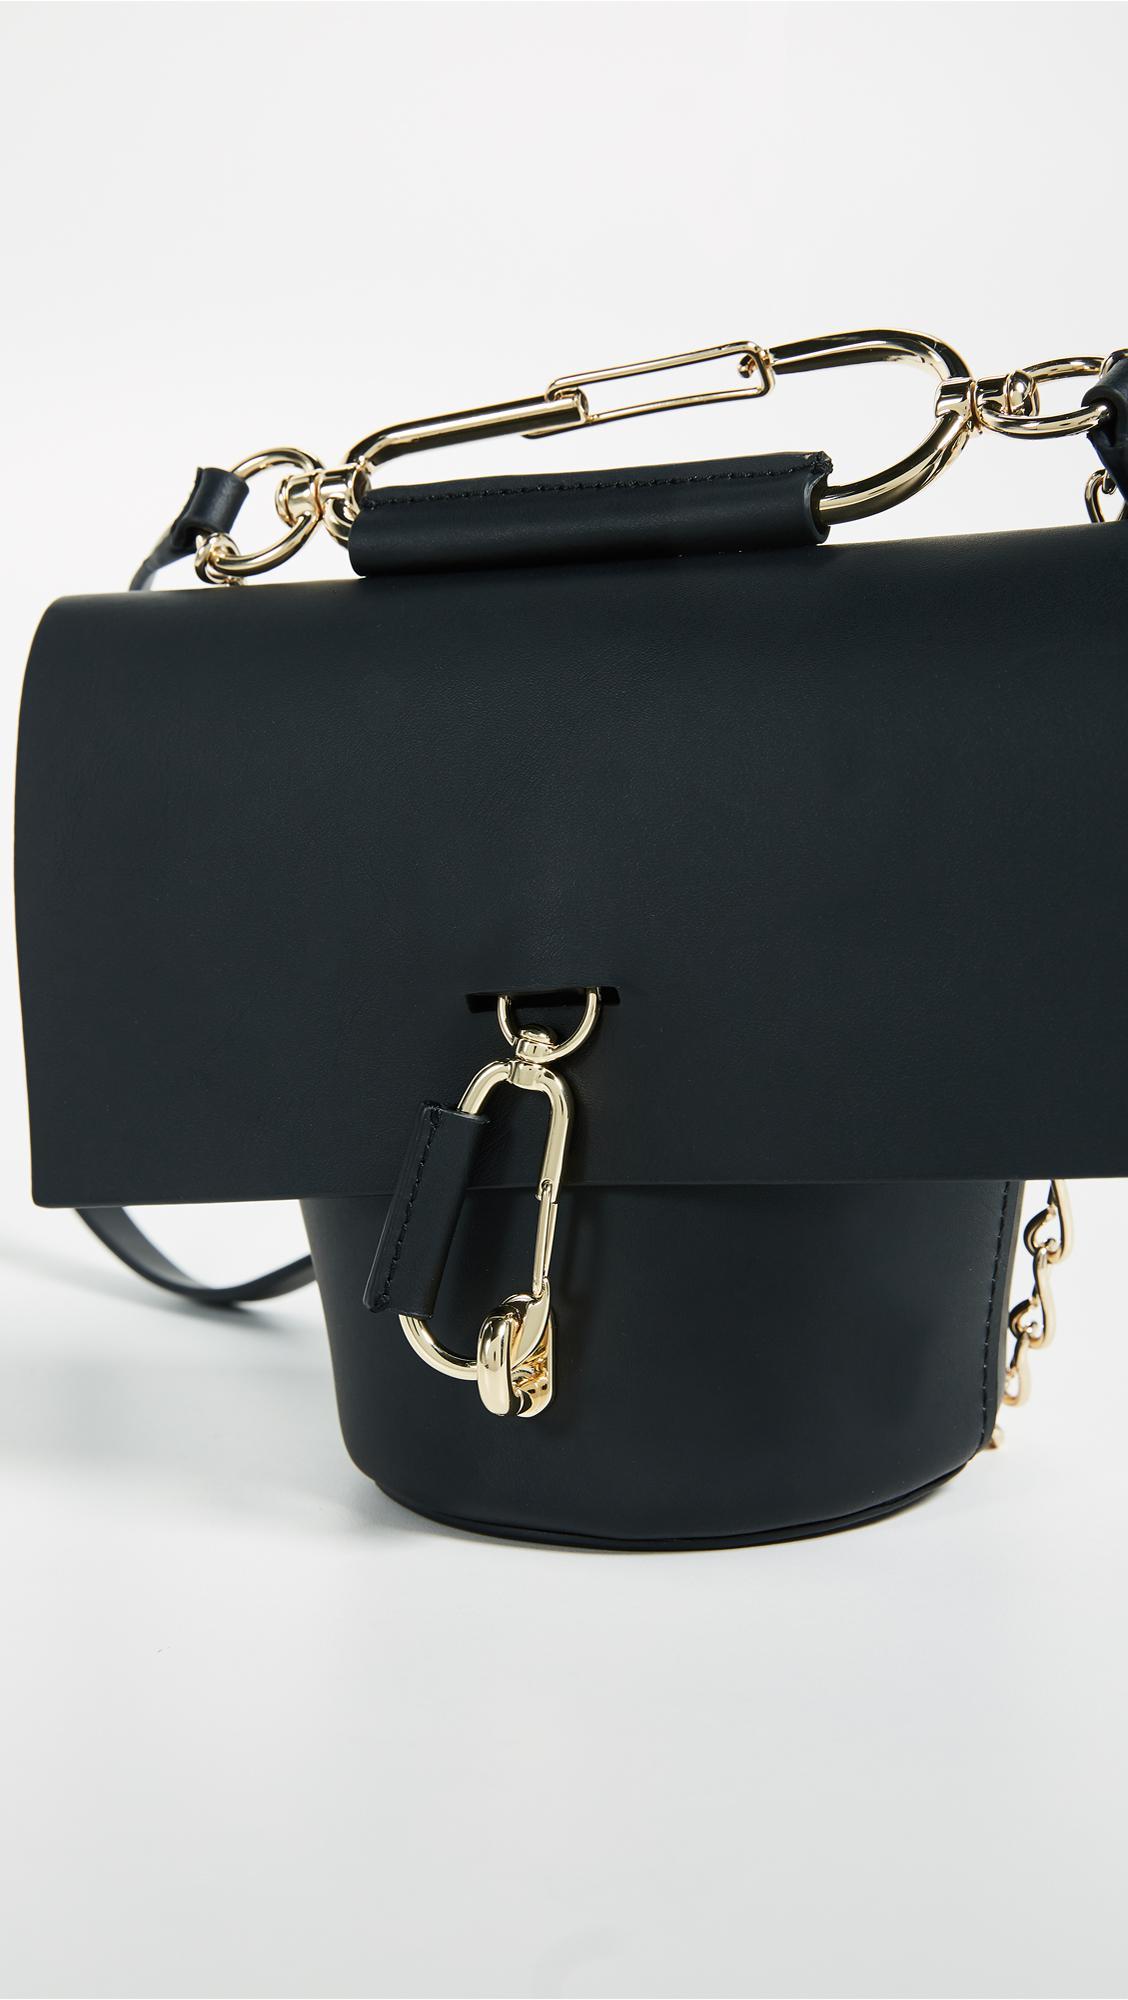 Zac Zac Posen Leather Belay Cross Body Bag With Chain in Black